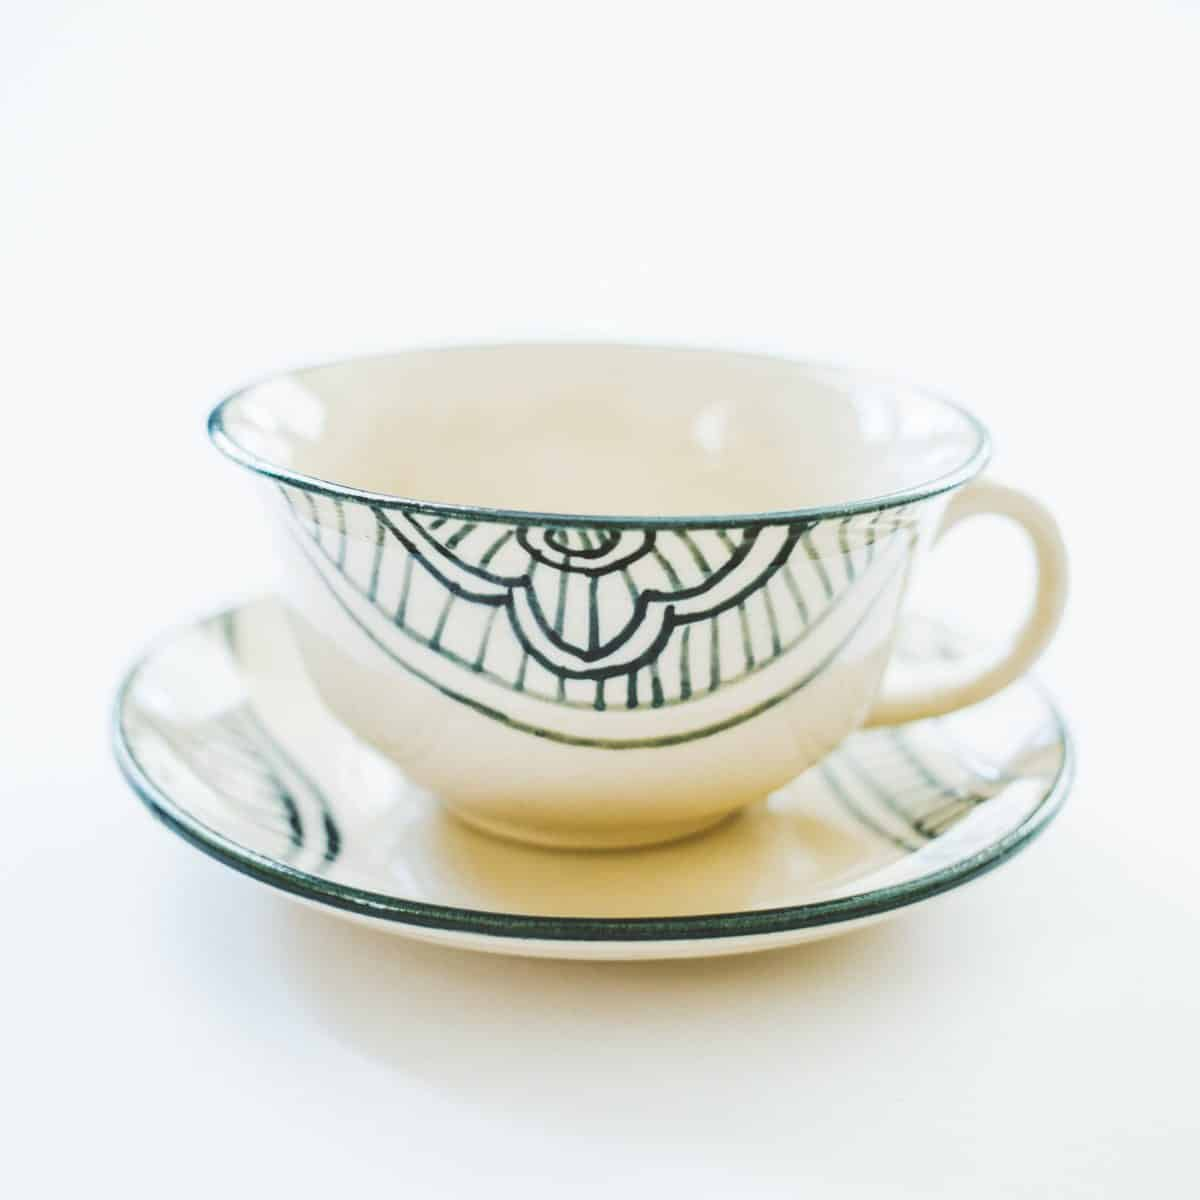 GlobeIn December 2016 Artisan Box Spoiler - Ceramic Cup + Saucer